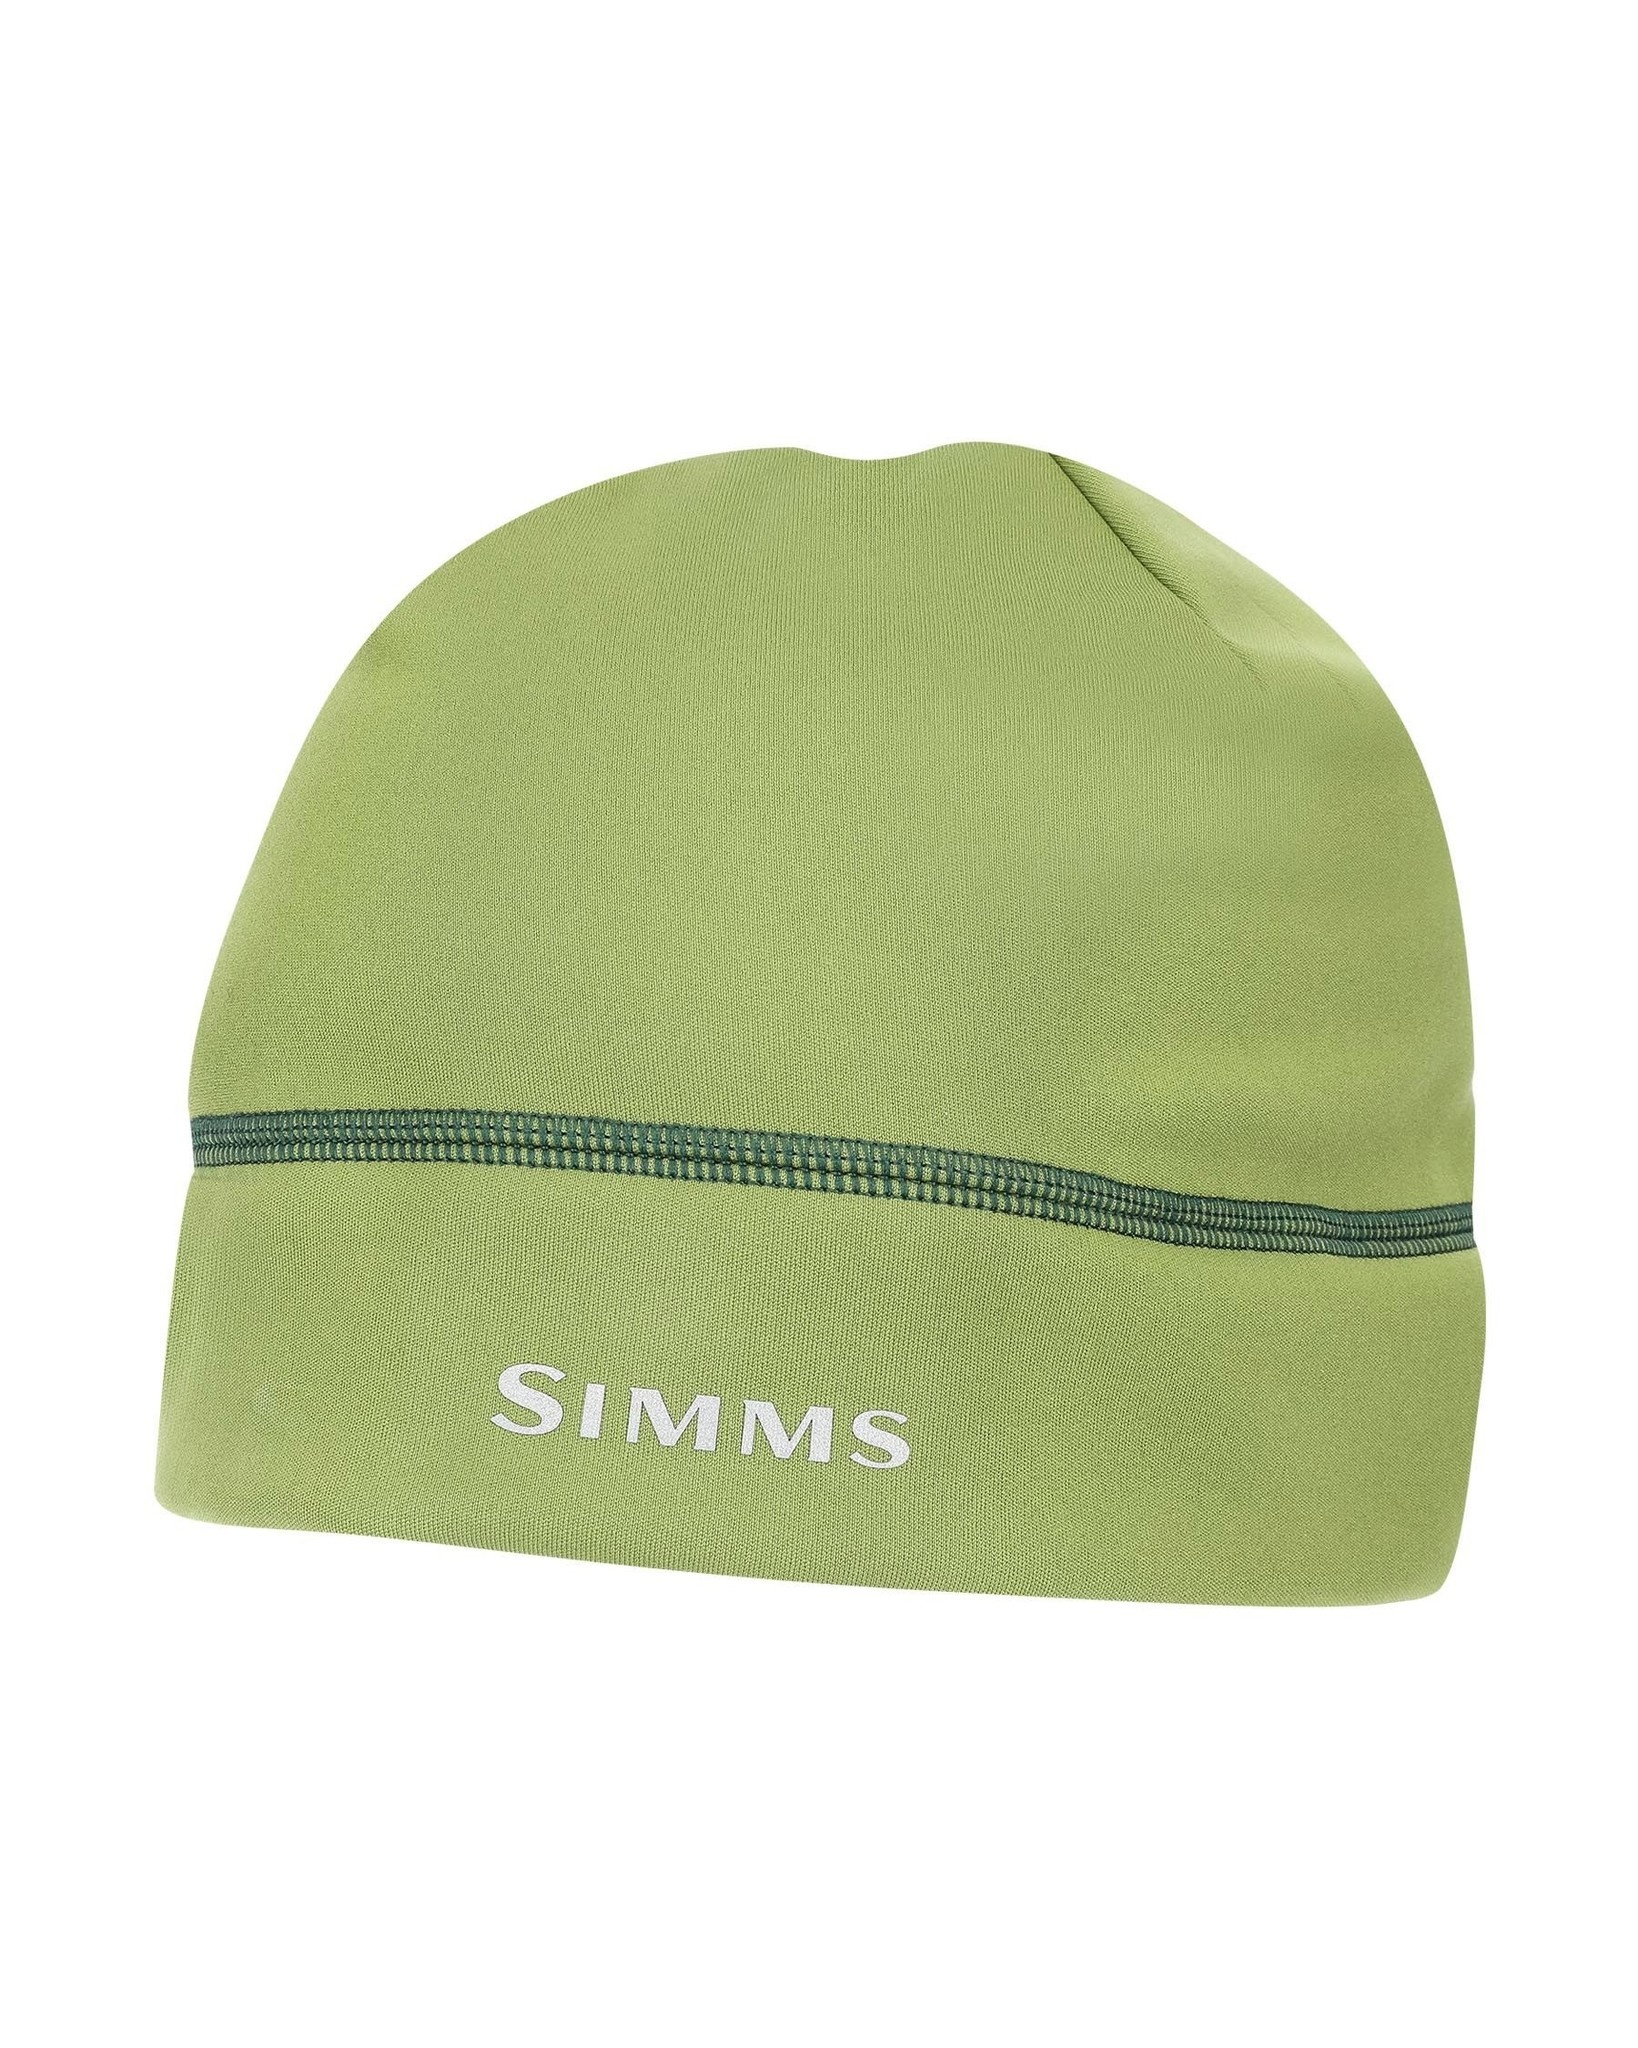 SIMMS Gore Infinium Wind Beanie - On Sale!